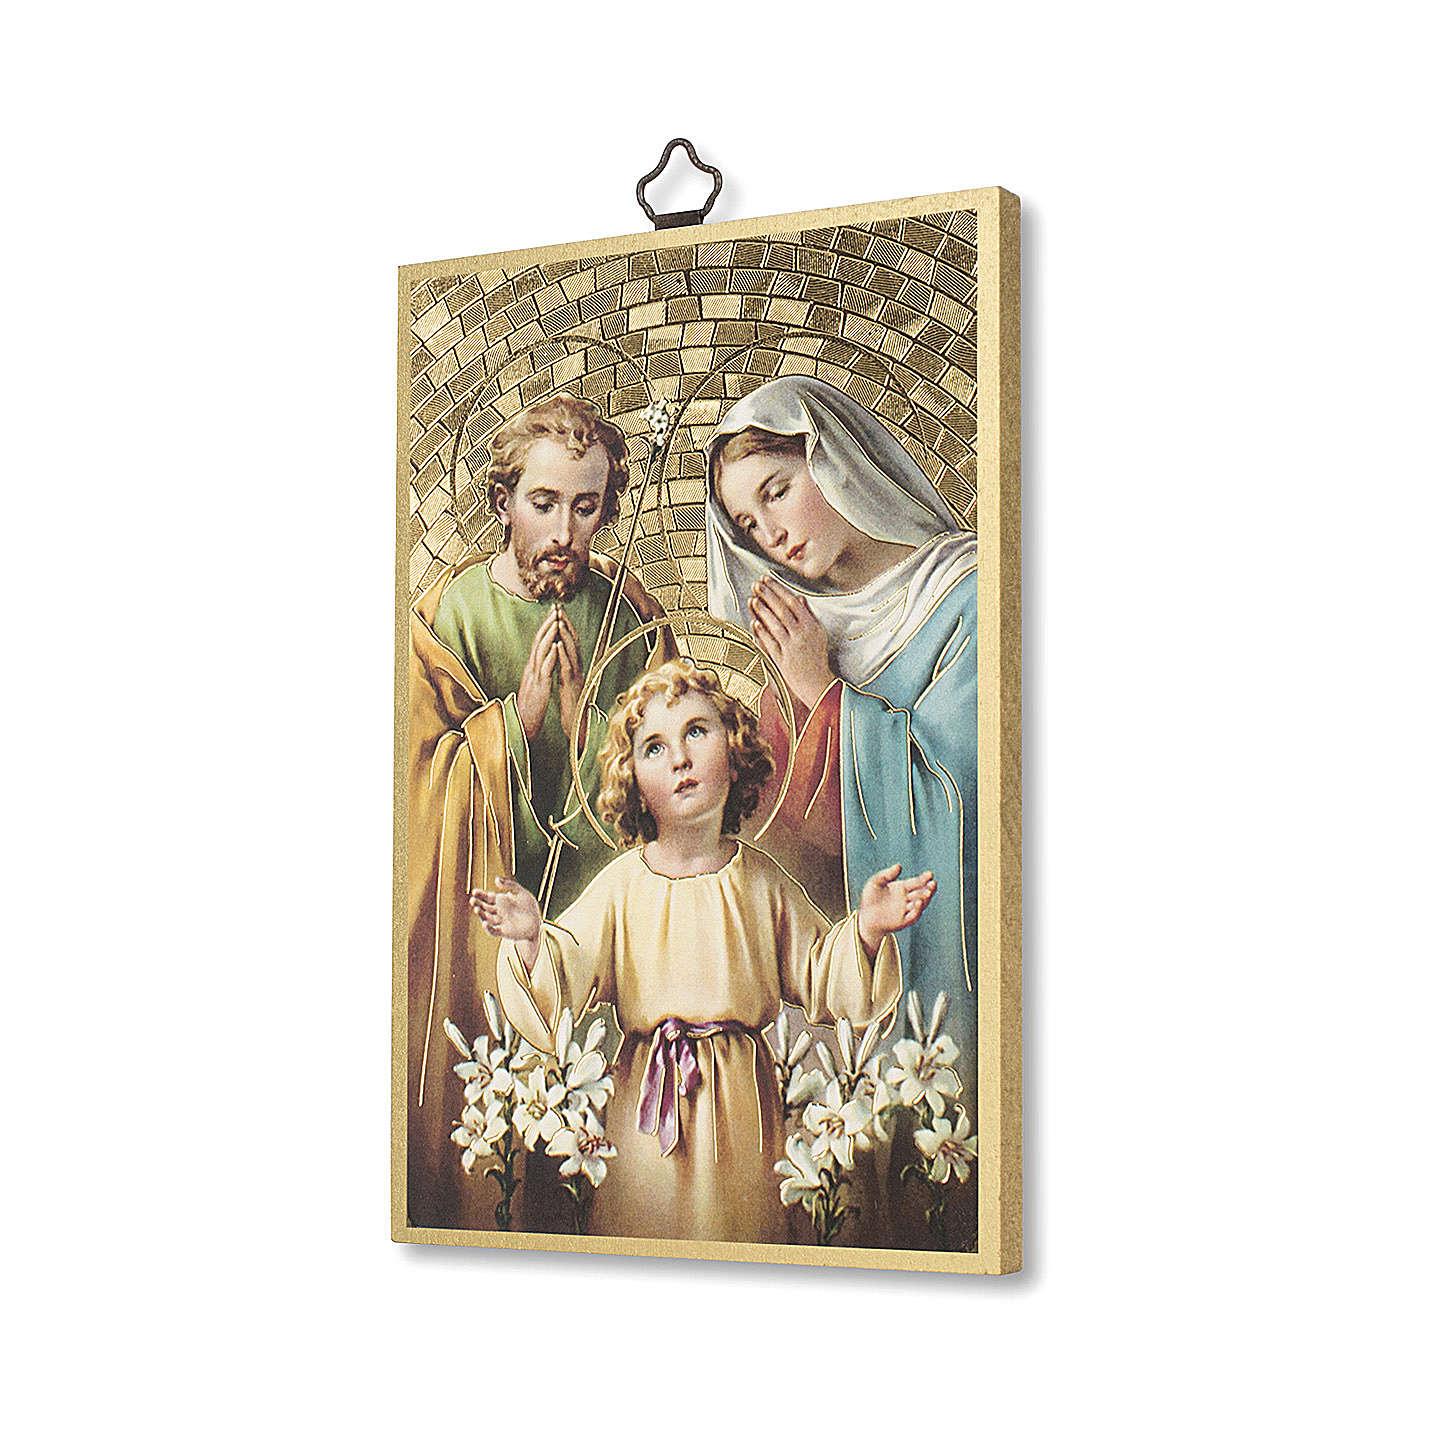 Holy Family of Nazareth woodcut 3